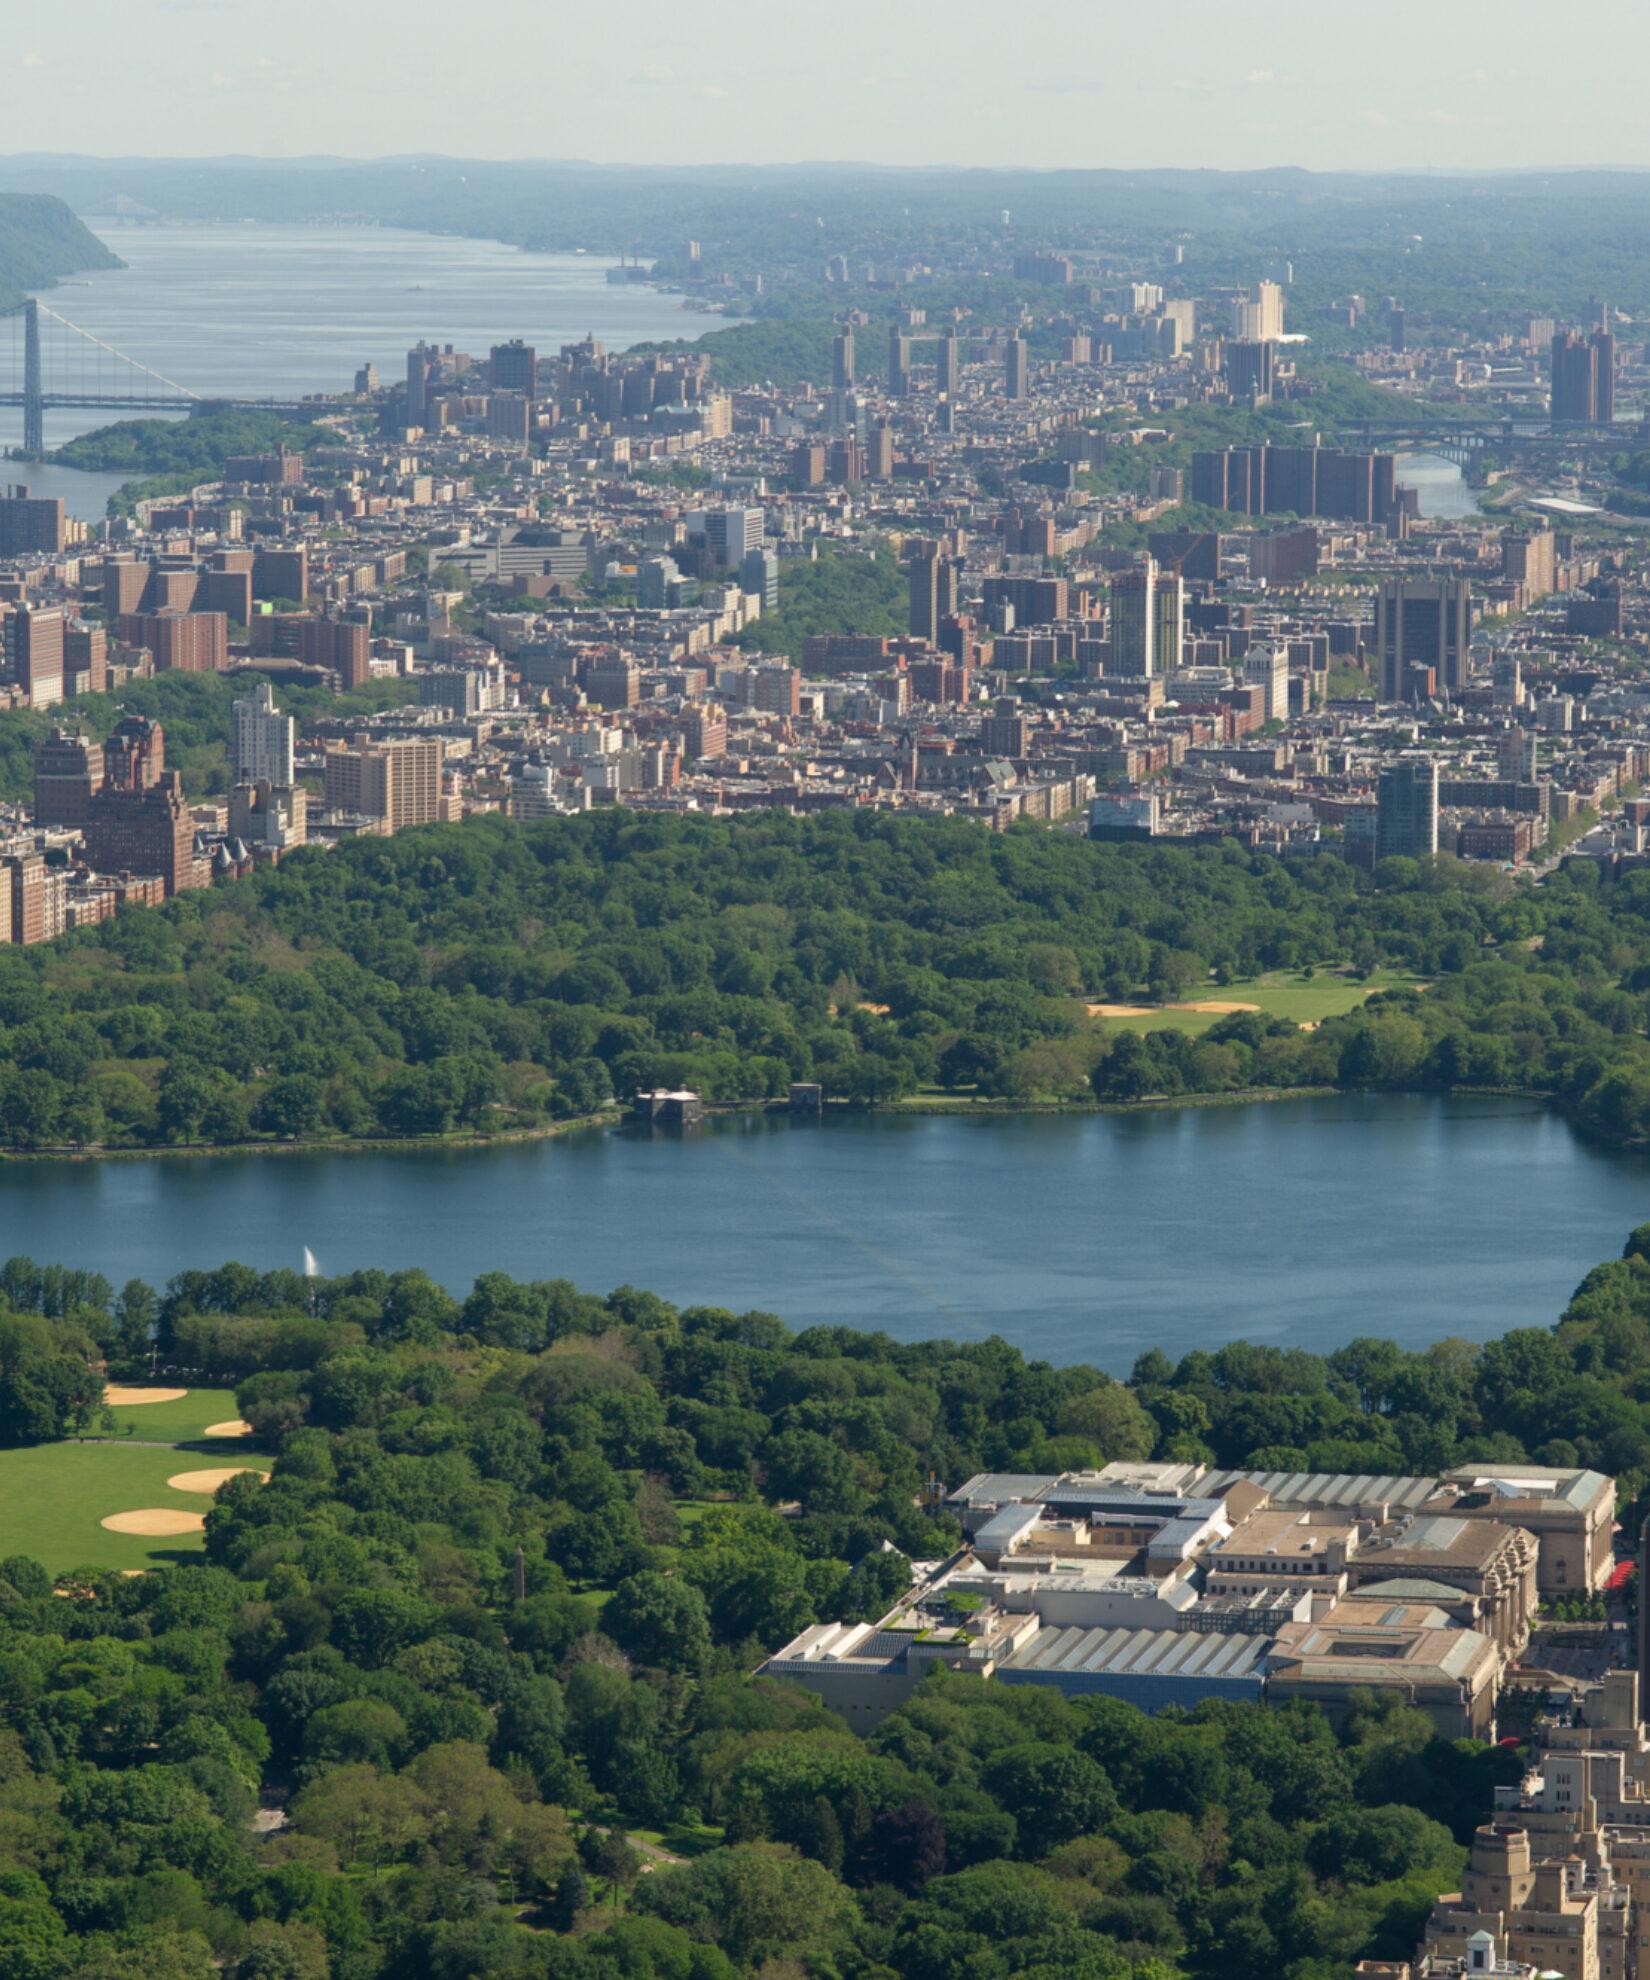 Aerial shot of the Reservoir in Central Park